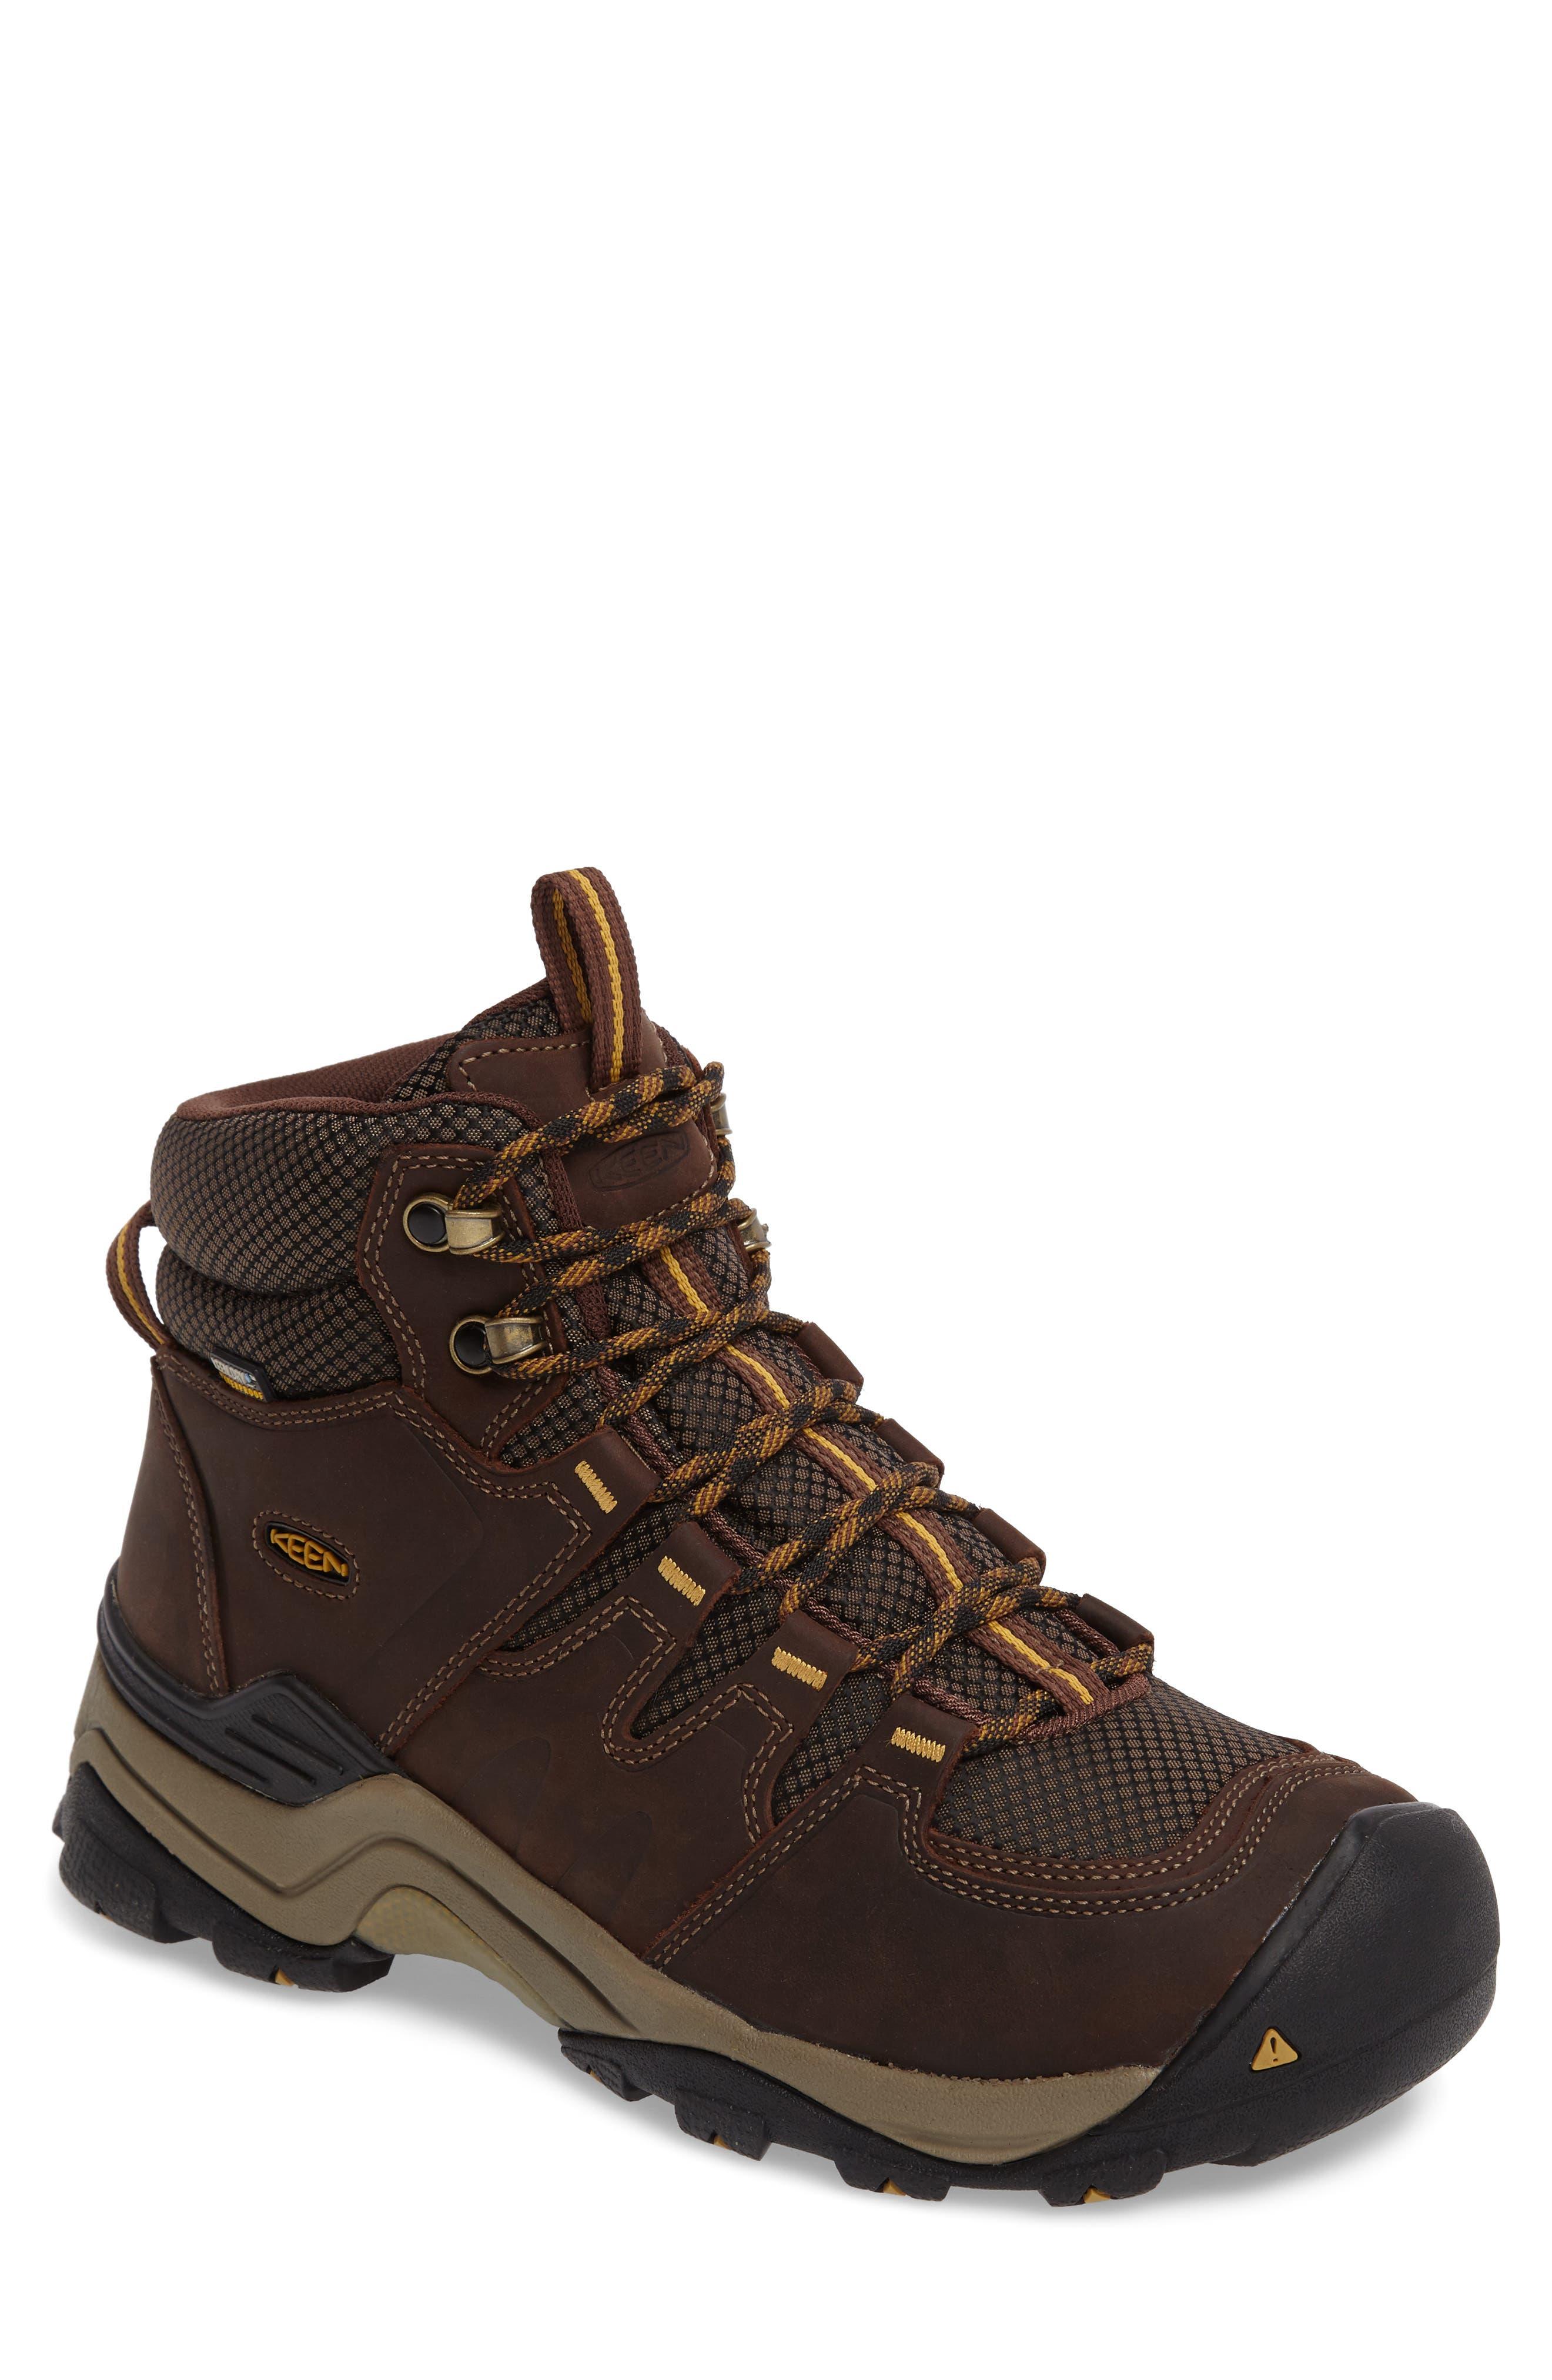 Main Image - Keen Gypsum II Waterproof Hiking Boot (Men)